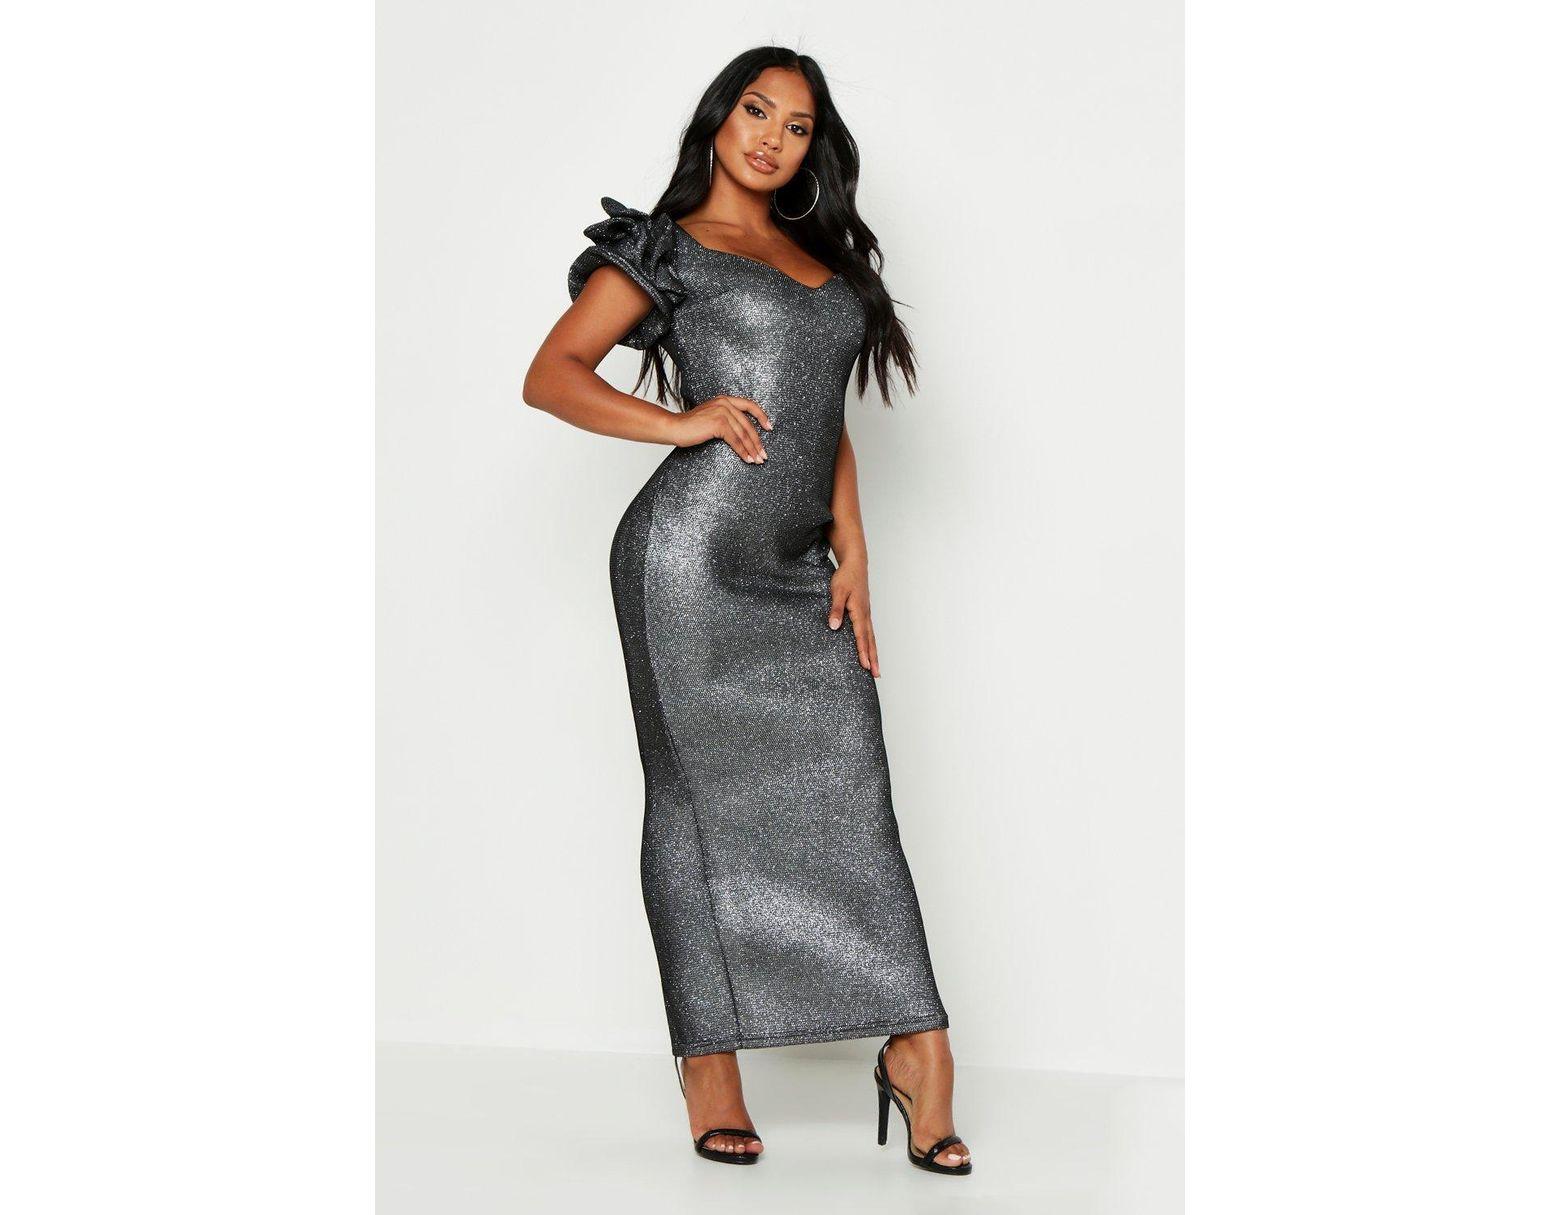 cfcb2931b77a Boohoo High Shimmer Plunge Midaxi Dress in Black - Lyst